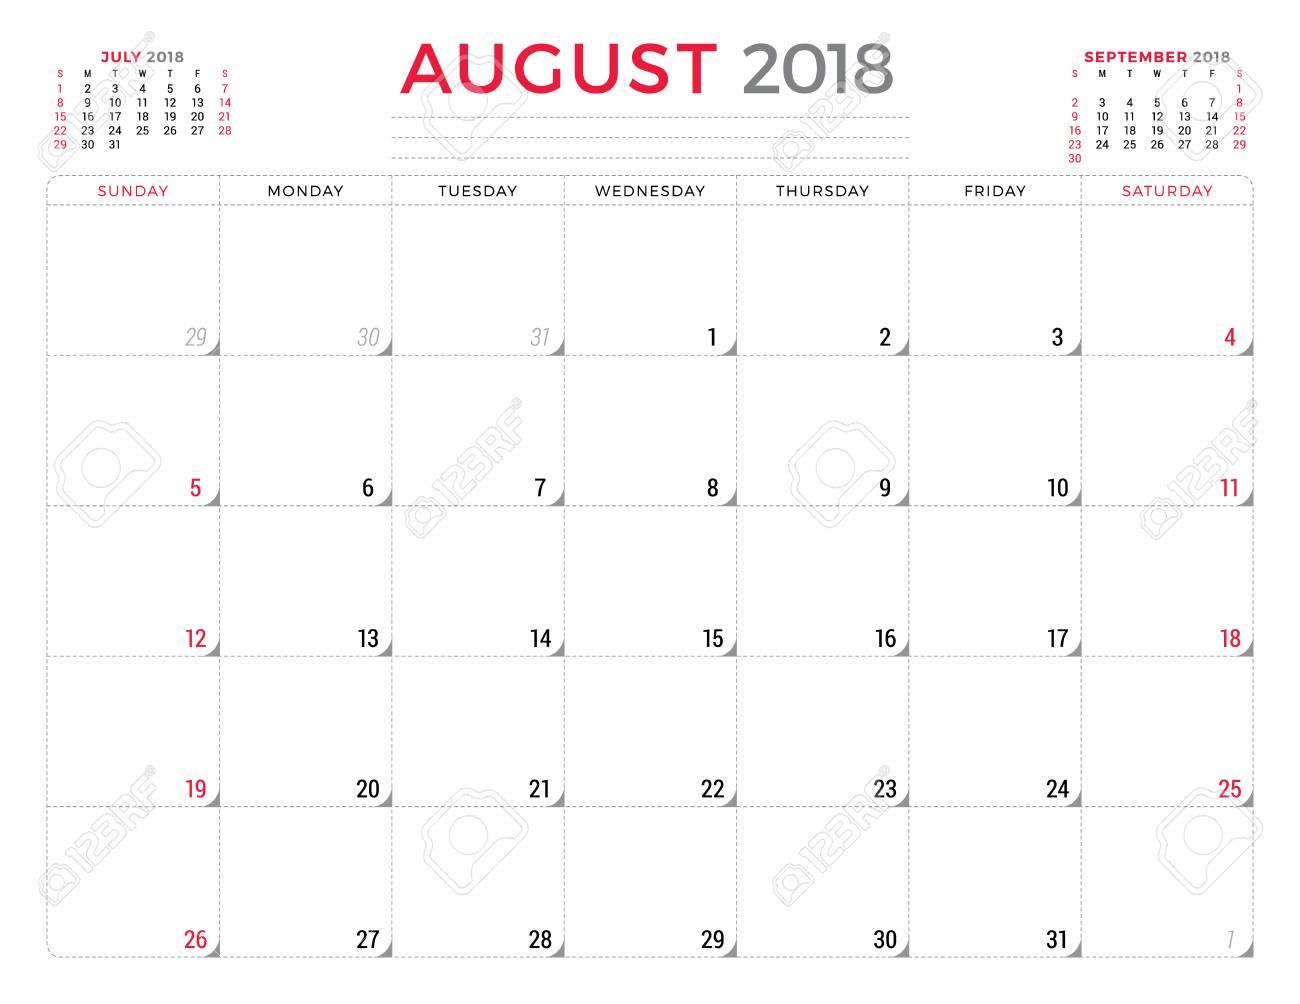 August 2018  Calendar planner design template  Week starts on